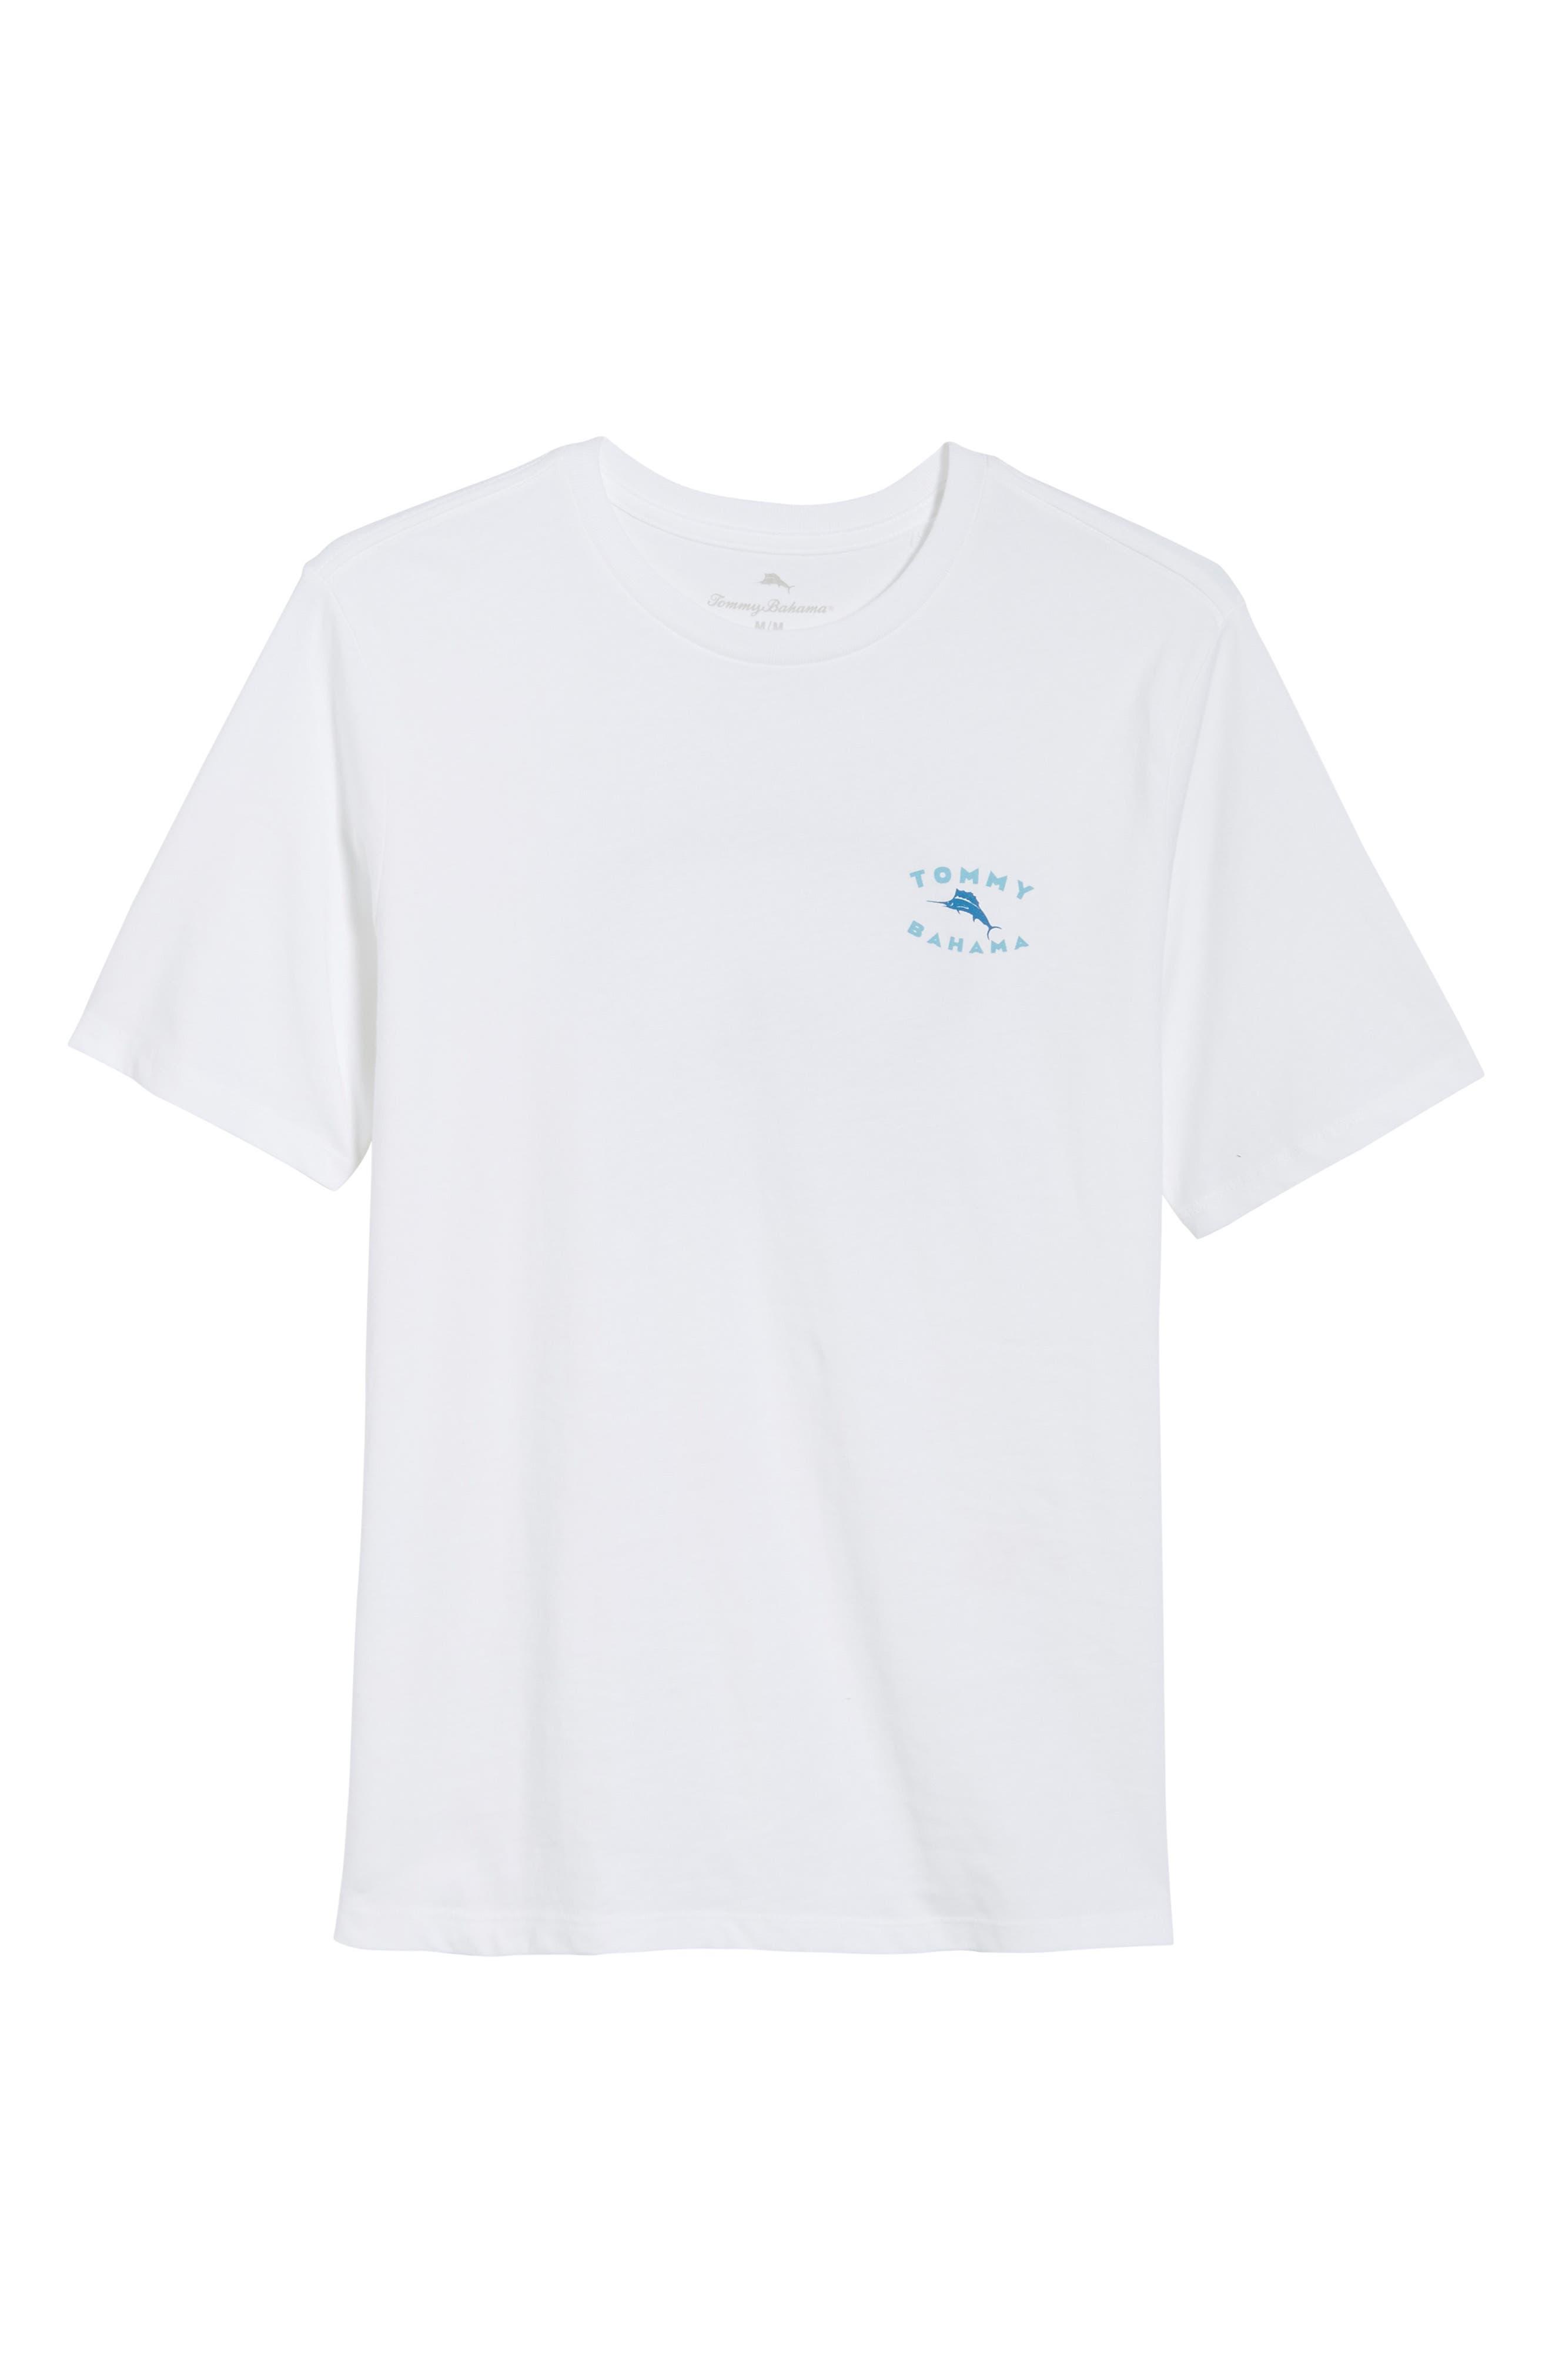 Complete Transparency T-Shirt,                             Alternate thumbnail 6, color,                             100